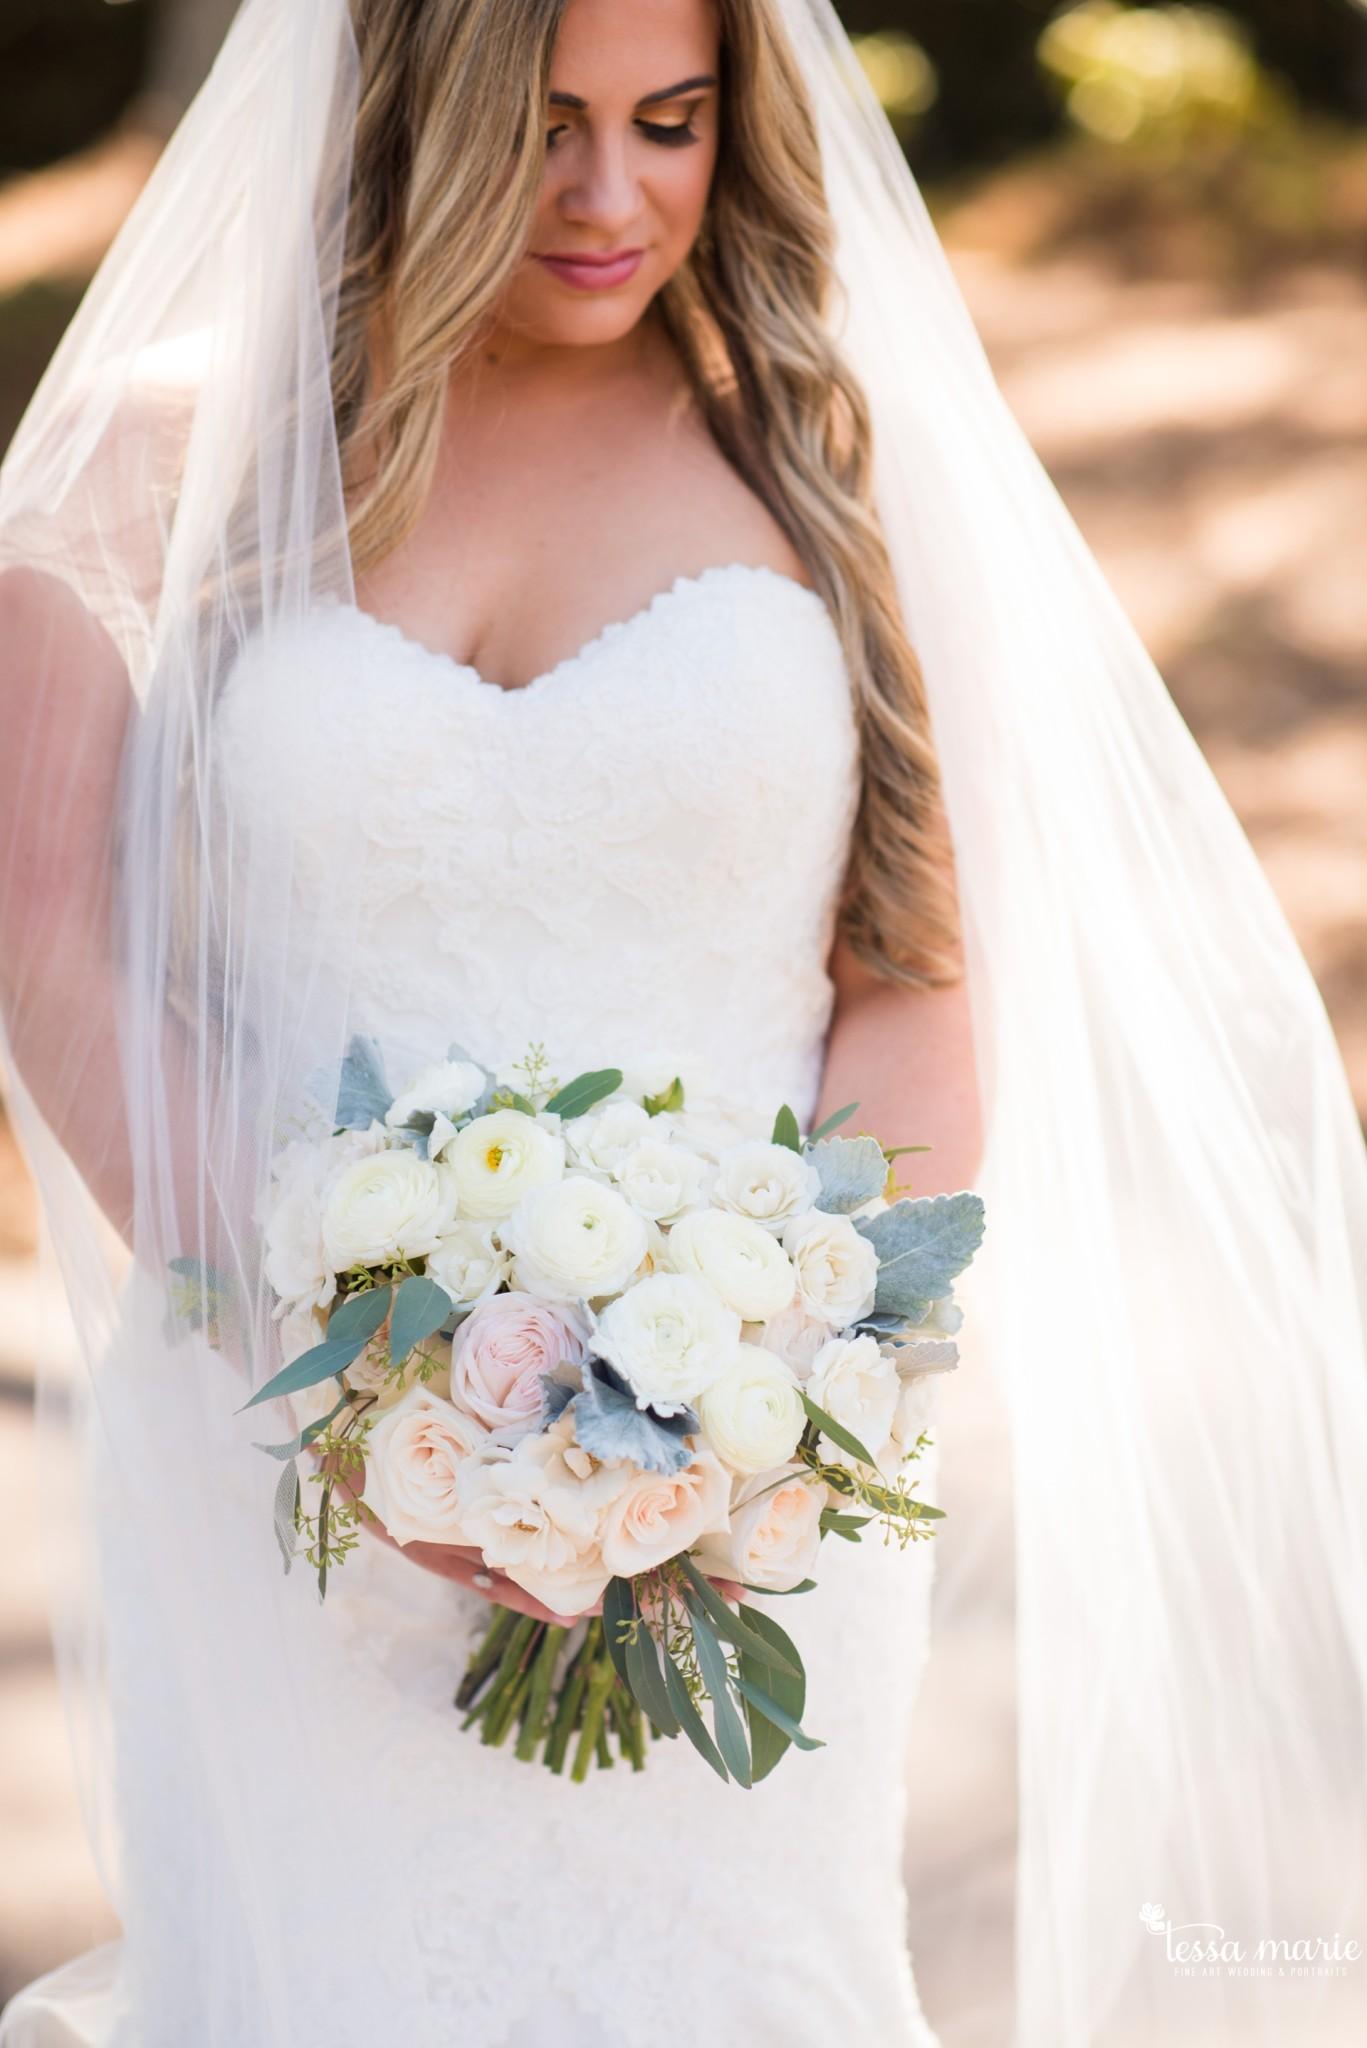 tessa_marie_legacy_moments_storytelling_candid_emotionally_driven_wedding_photographer_atlanta_wedding_photography_st_ives_country_club_wedding_boukates_bridals_by_lori_0006